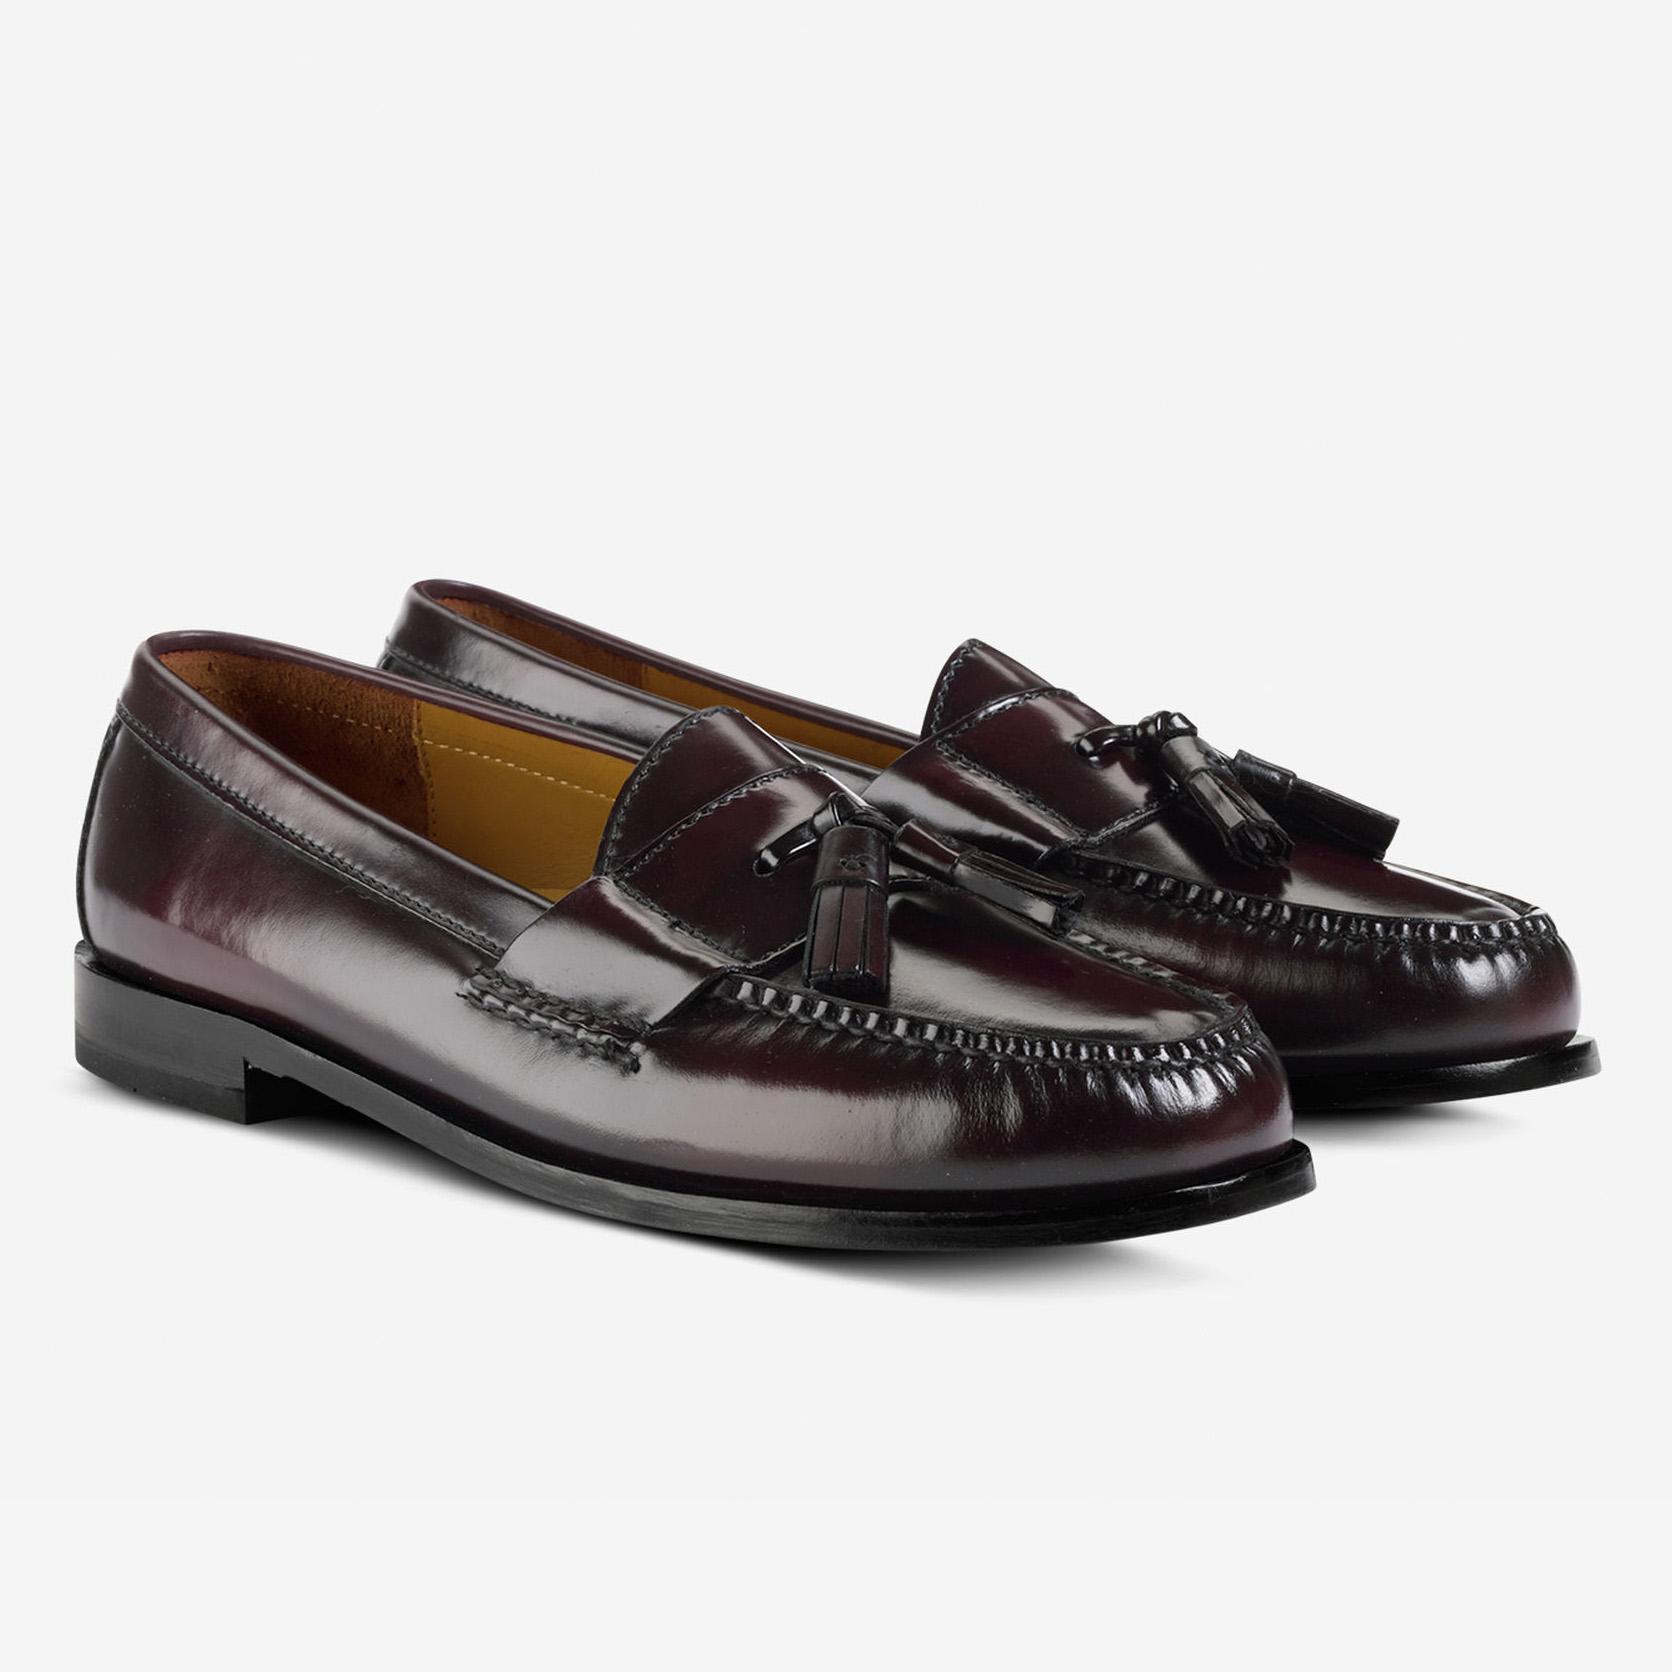 de9683544a Cole Haan Men's Pinch Tassel Loafer Burgundy | Laurie's Shoes